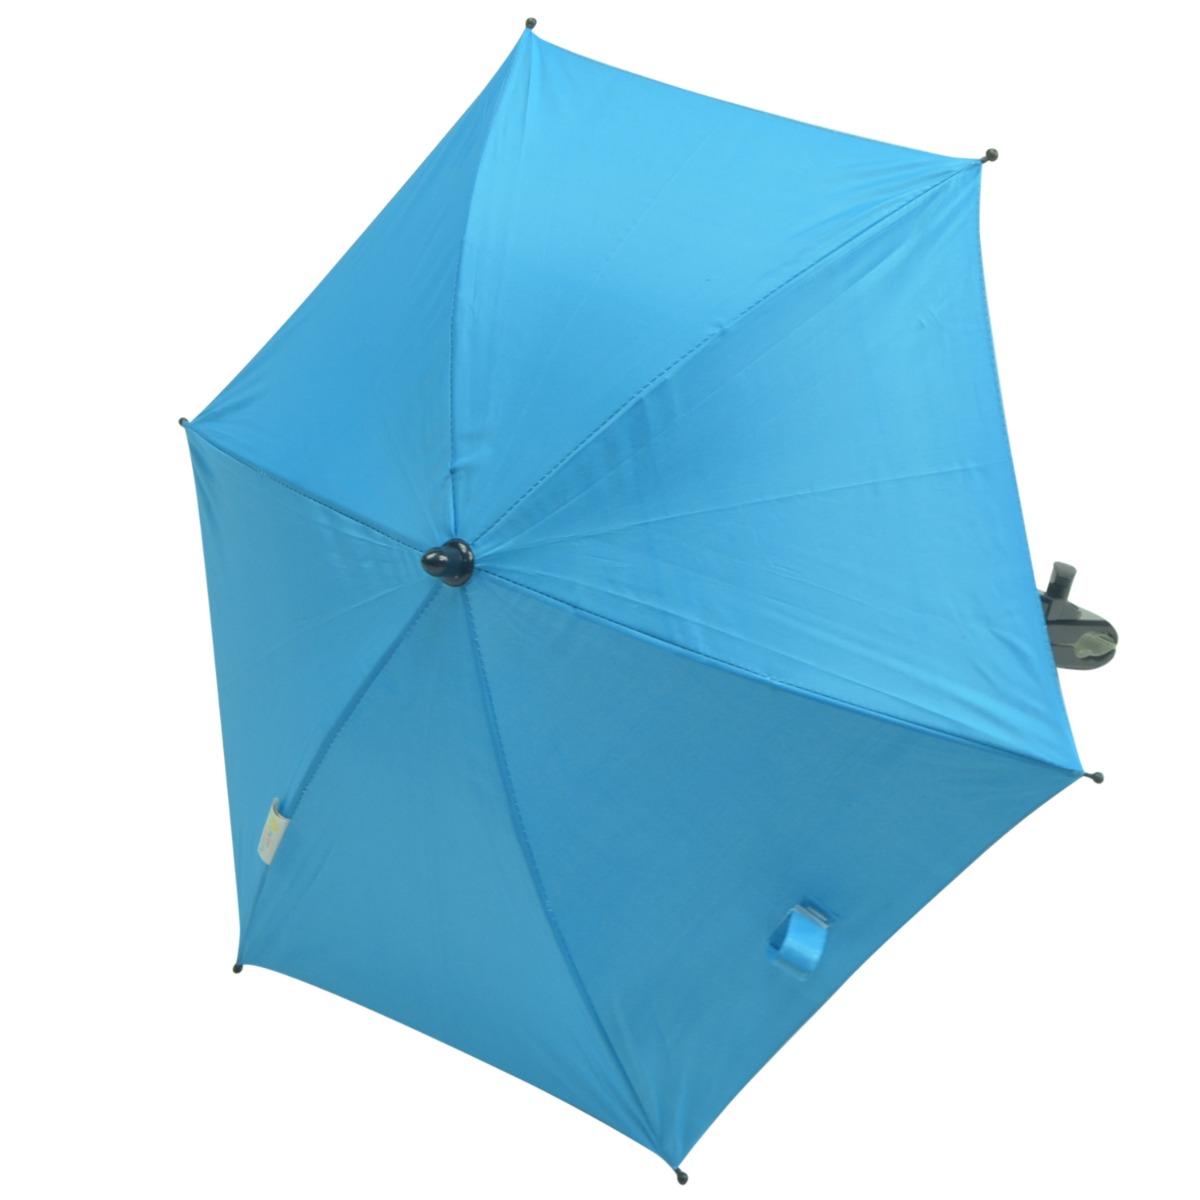 Baby Parasol Umbrella Compatible With Britax Canopy Protect Sun /& Rain